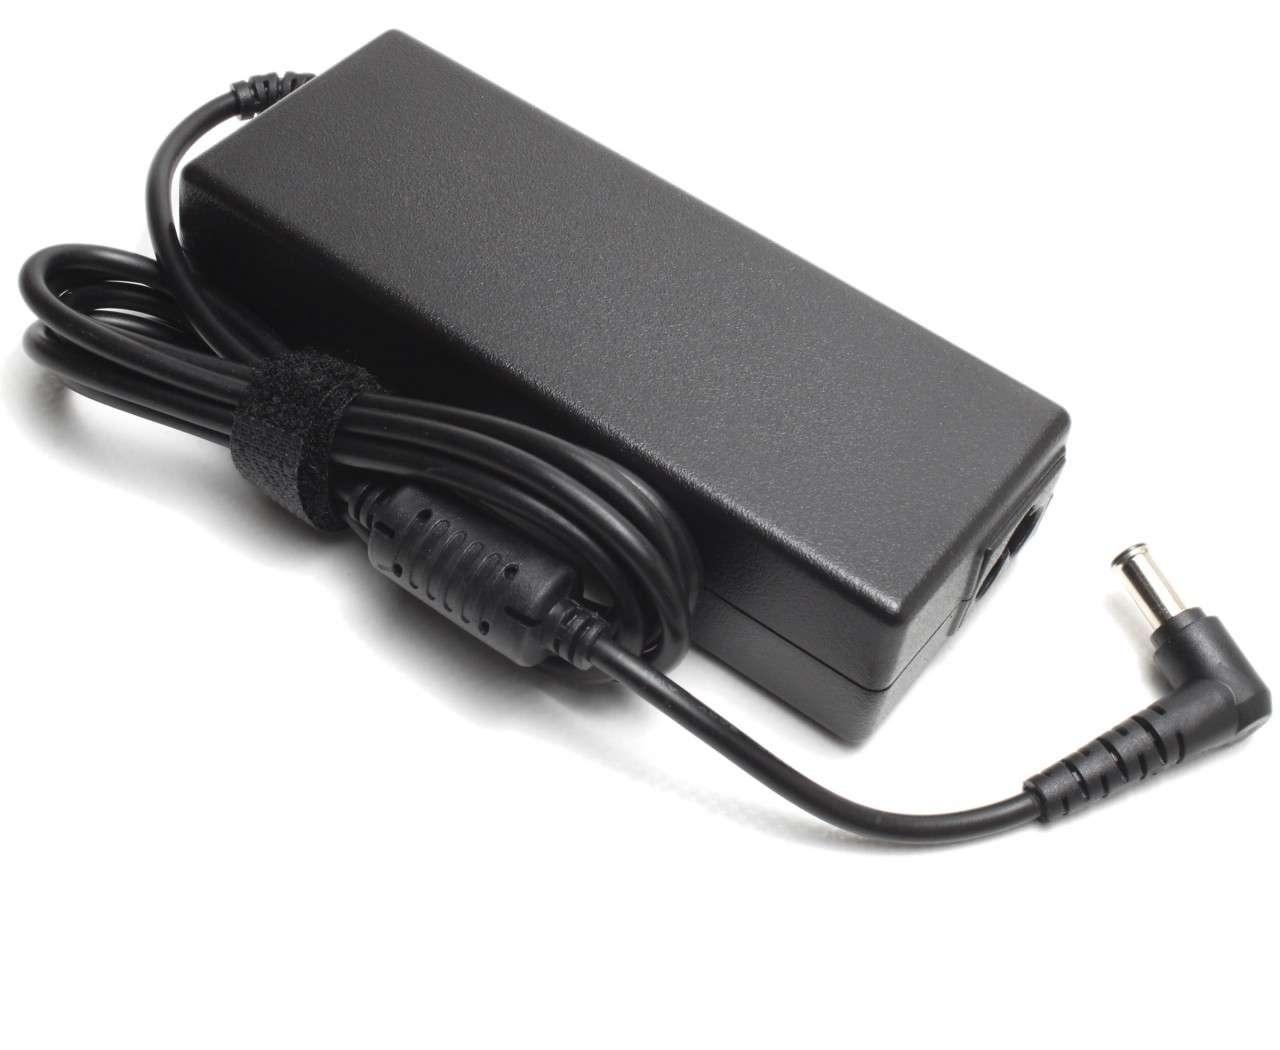 Incarcator Sony Vaio VGN N150 Replacement imagine powerlaptop.ro 2021